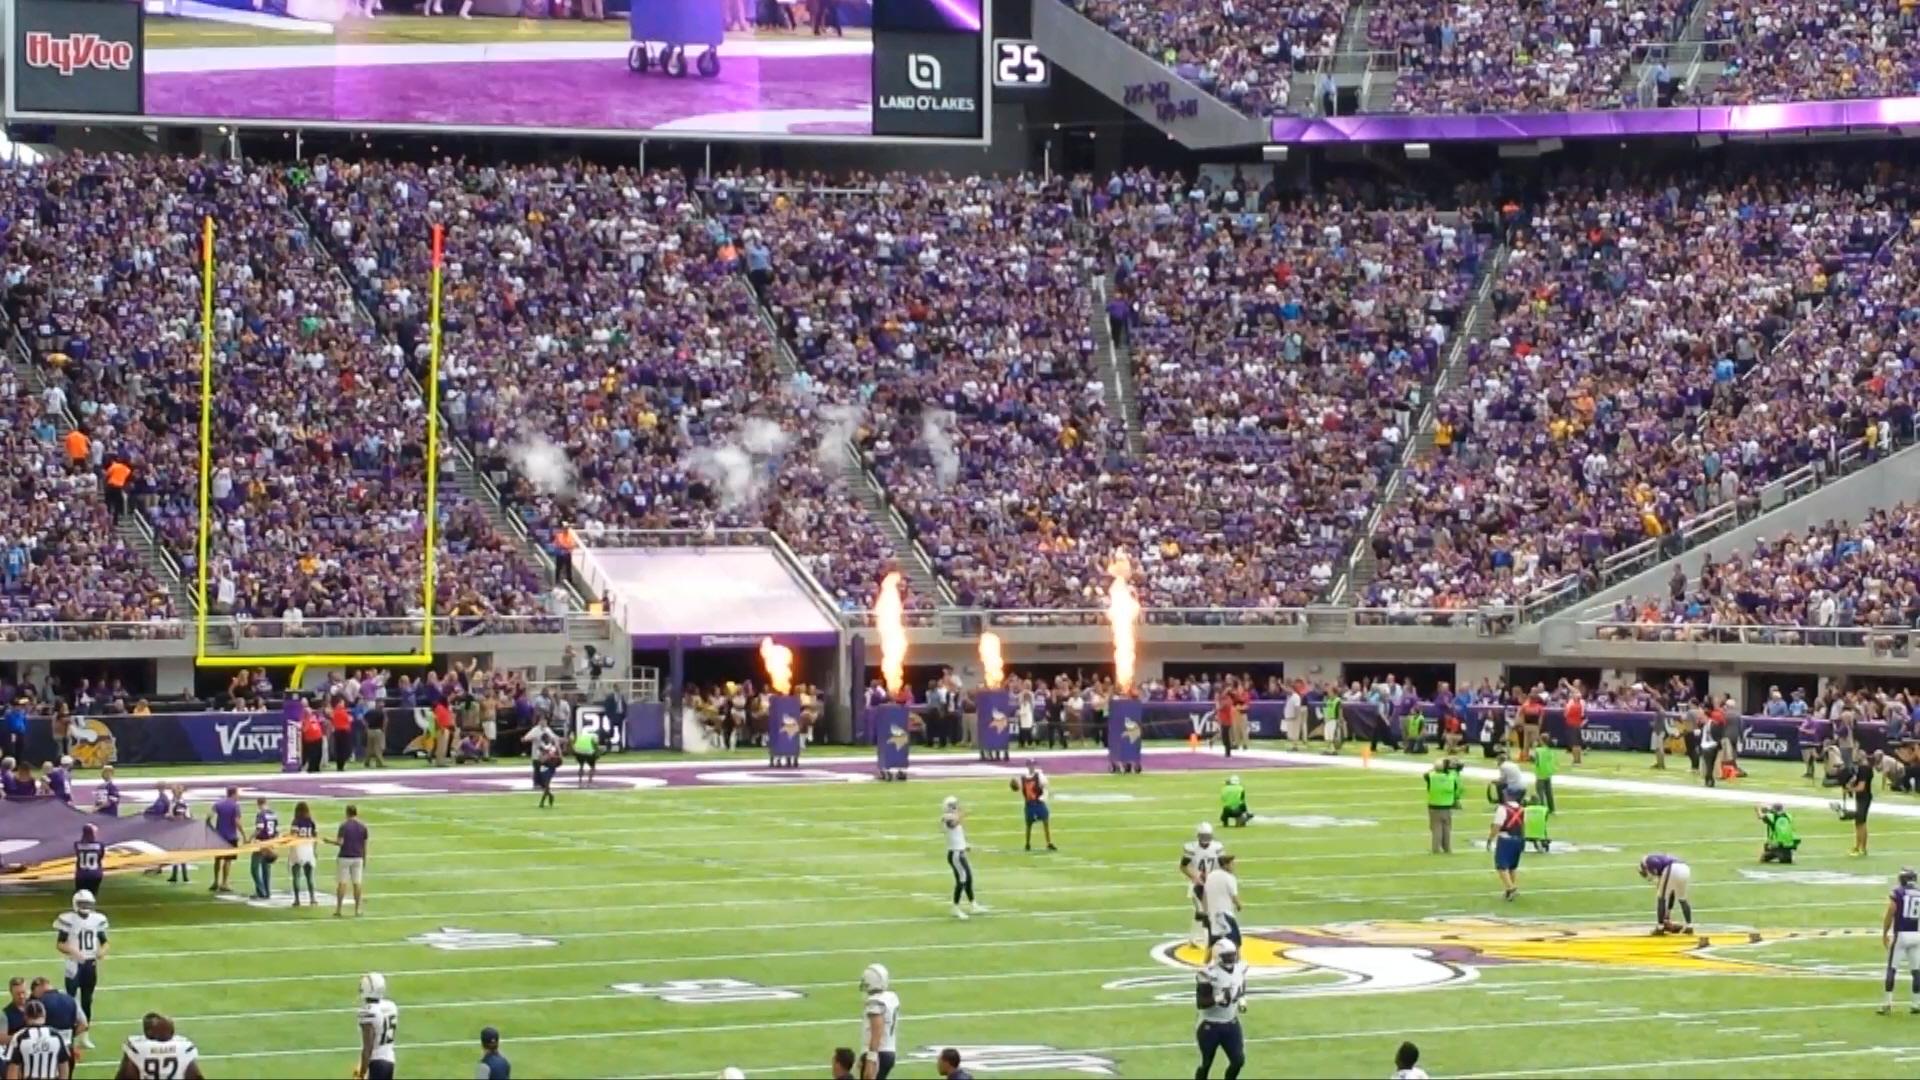 Minnesota Vikings U.S. Bank Stadium First Game - Fire